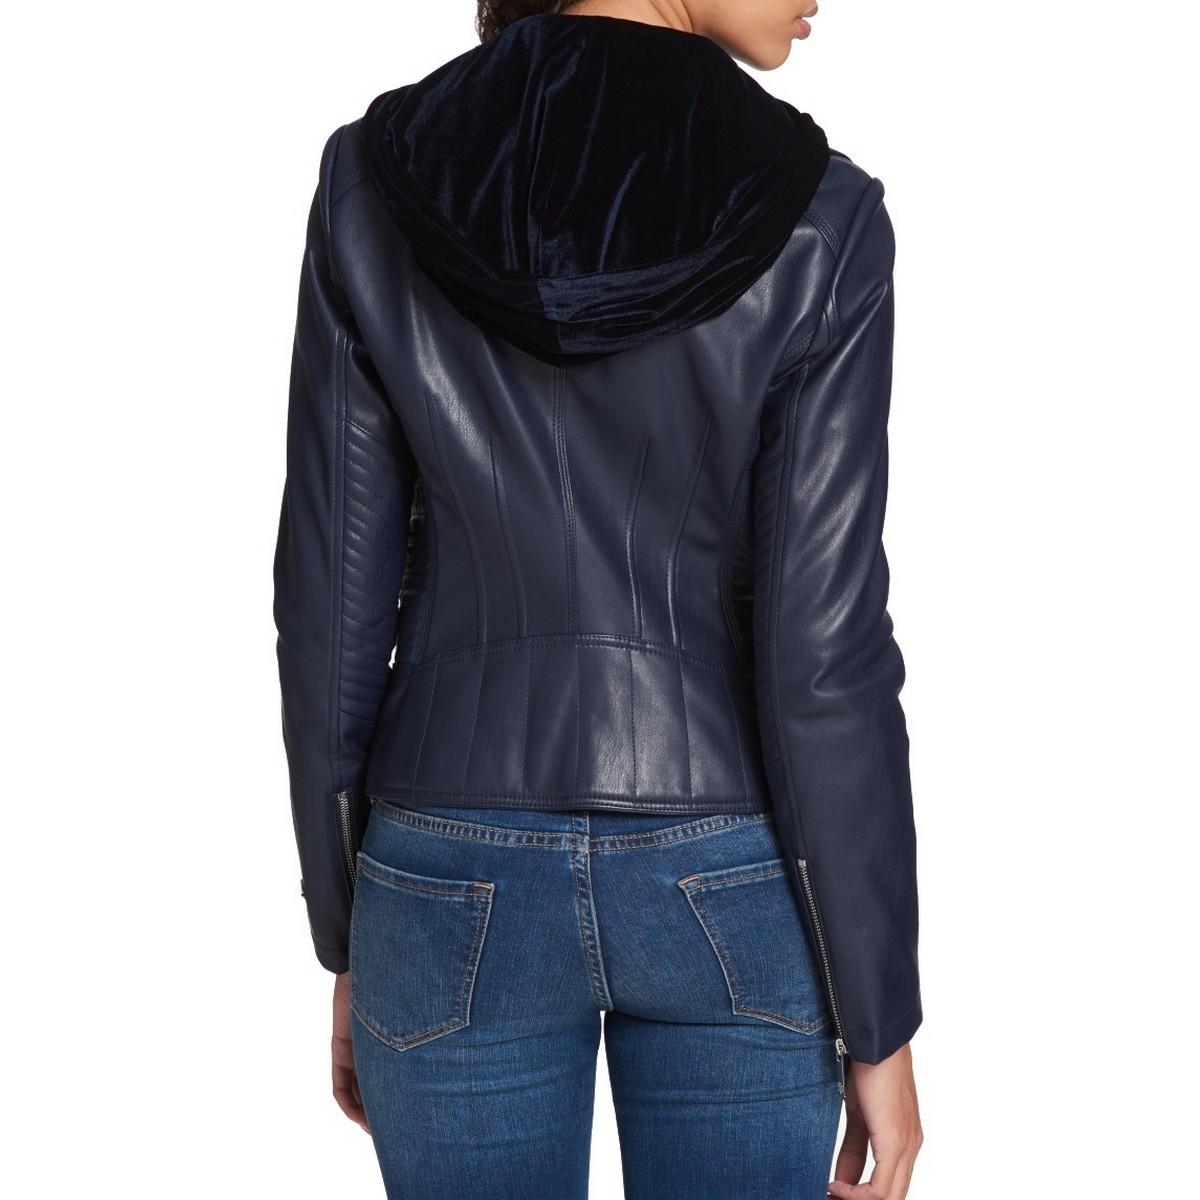 TOMMY HILFIGER Women/'s Layered-Look Velvet Hood Motorcycle Jacket Top TEDO